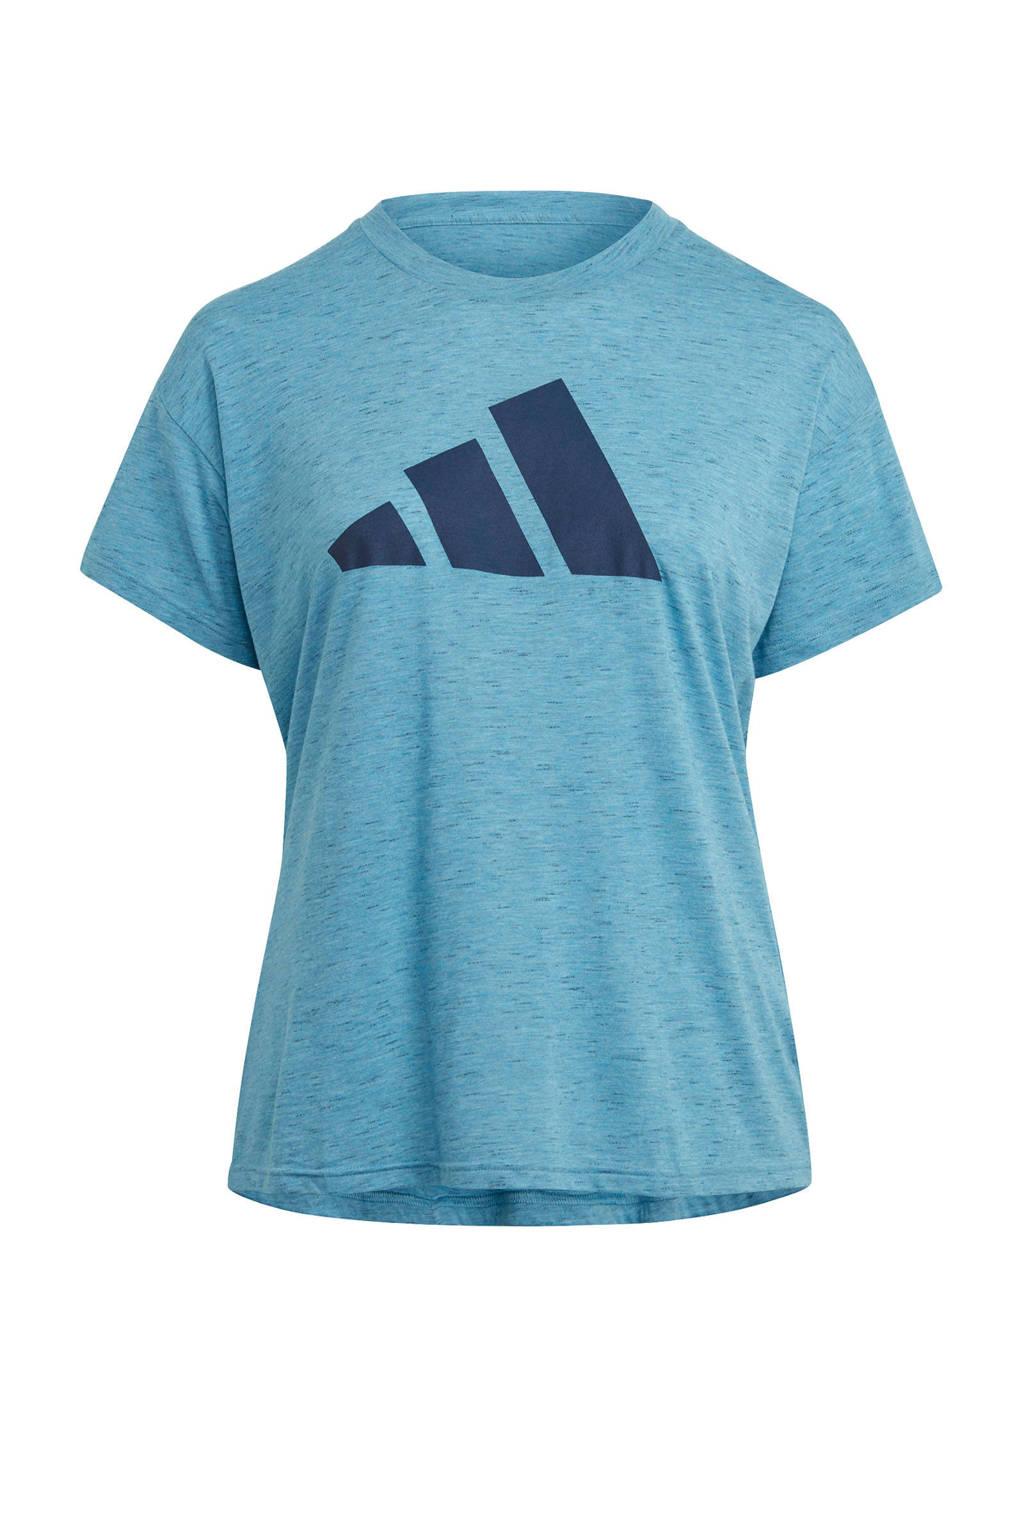 adidas Performance Plus Size 2.0 Sportwear sport T-shirt blauw, Blauw